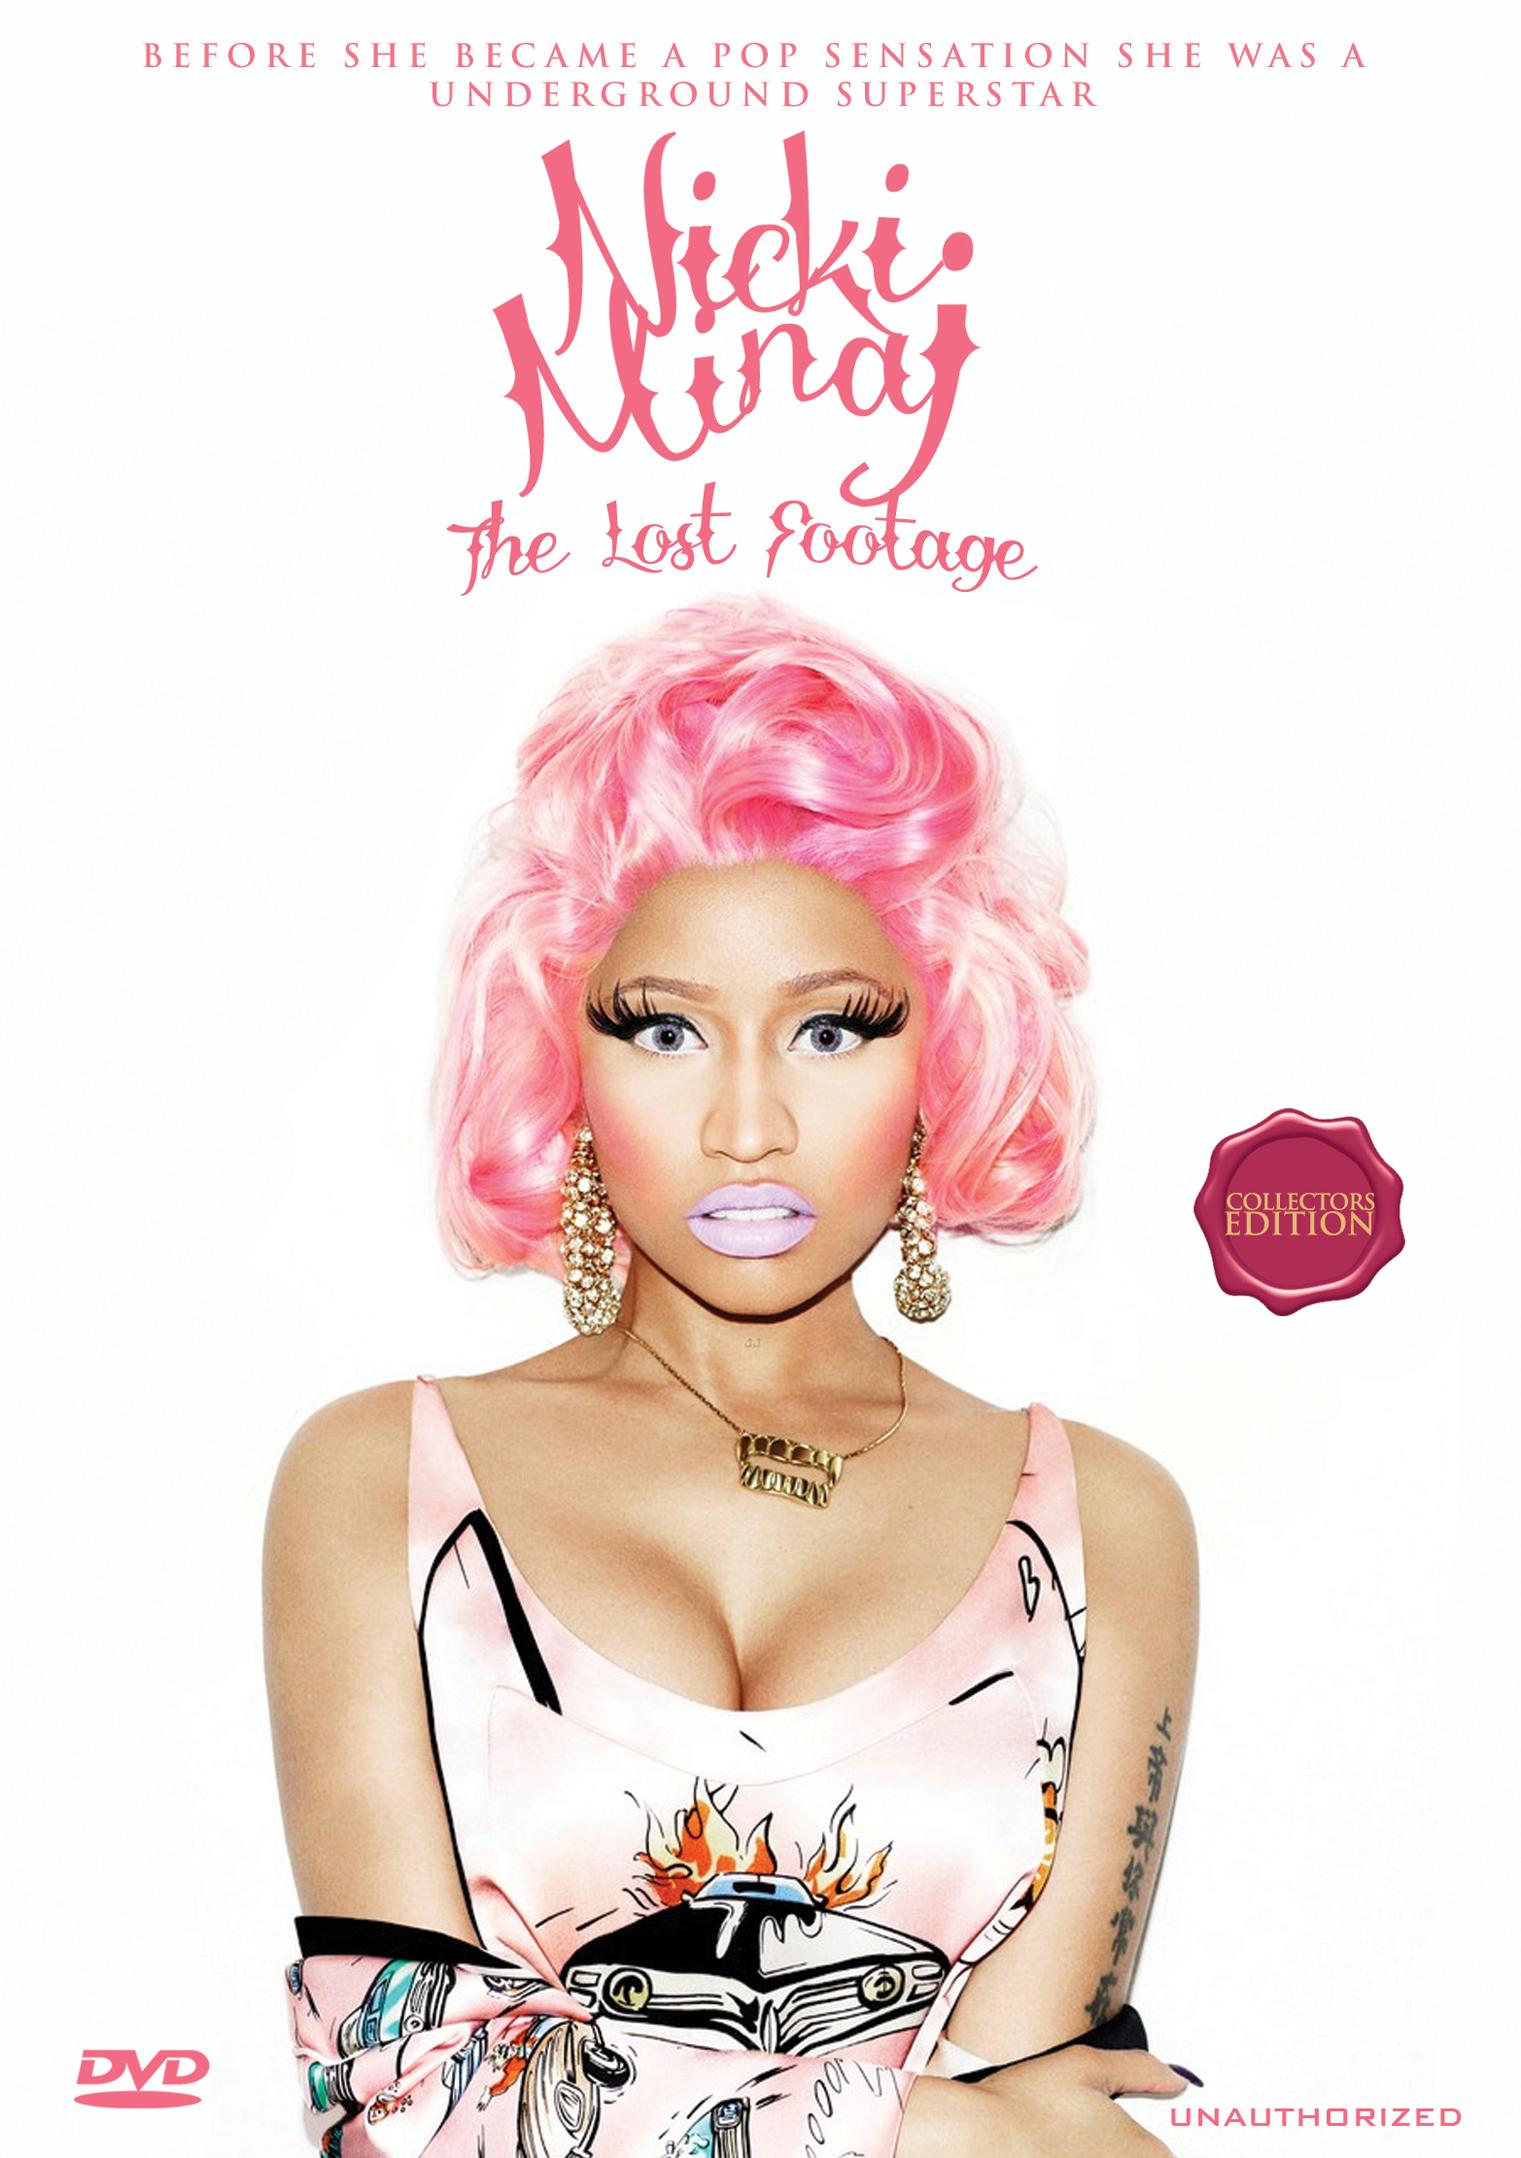 Nicki Minaj: The Lost Footage - Unauthorized